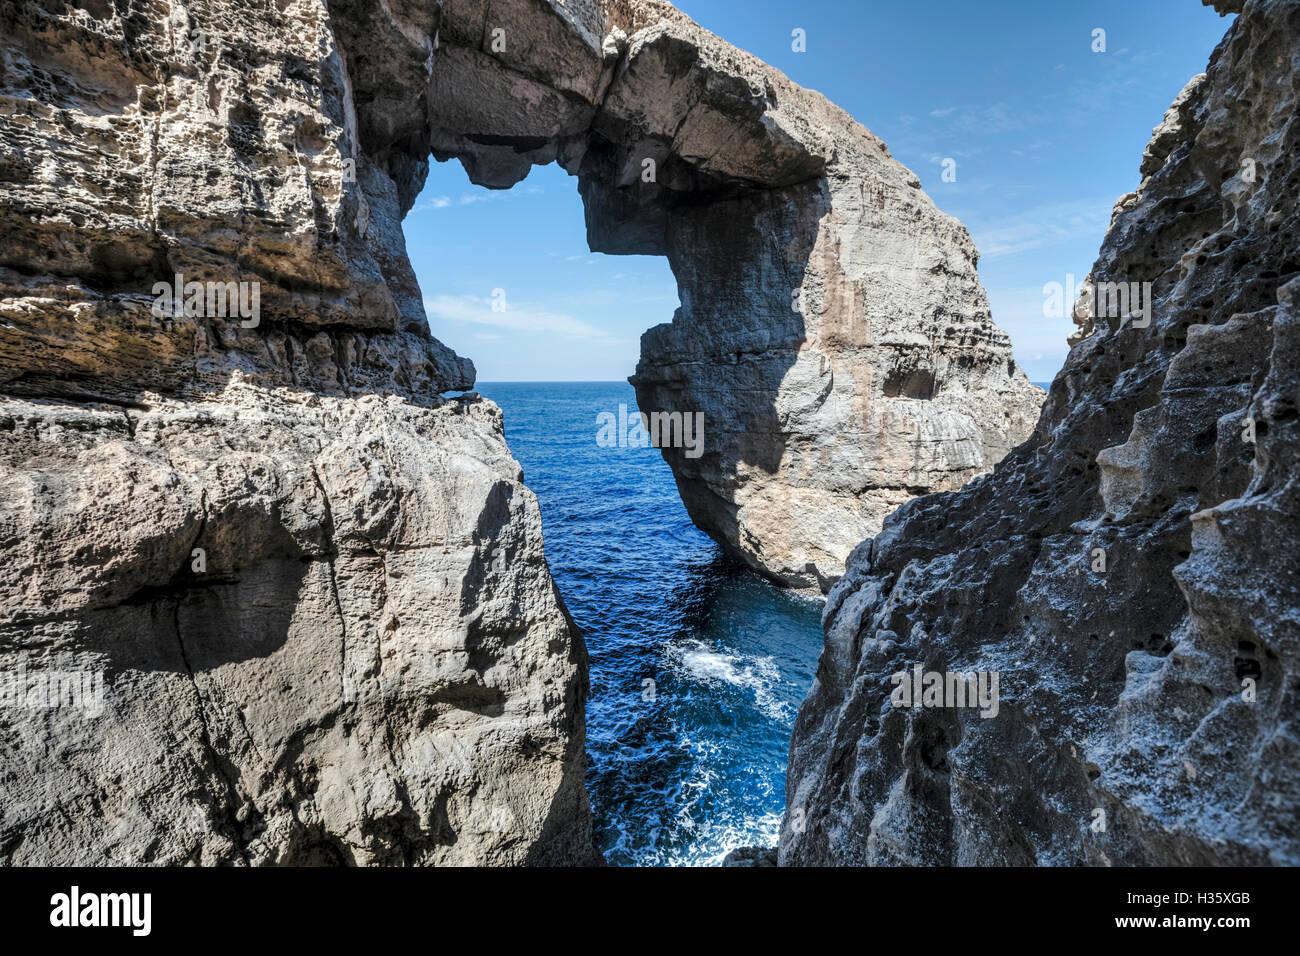 Wied Il Mielah, Gharb, Gozo, Malta - Stock Image